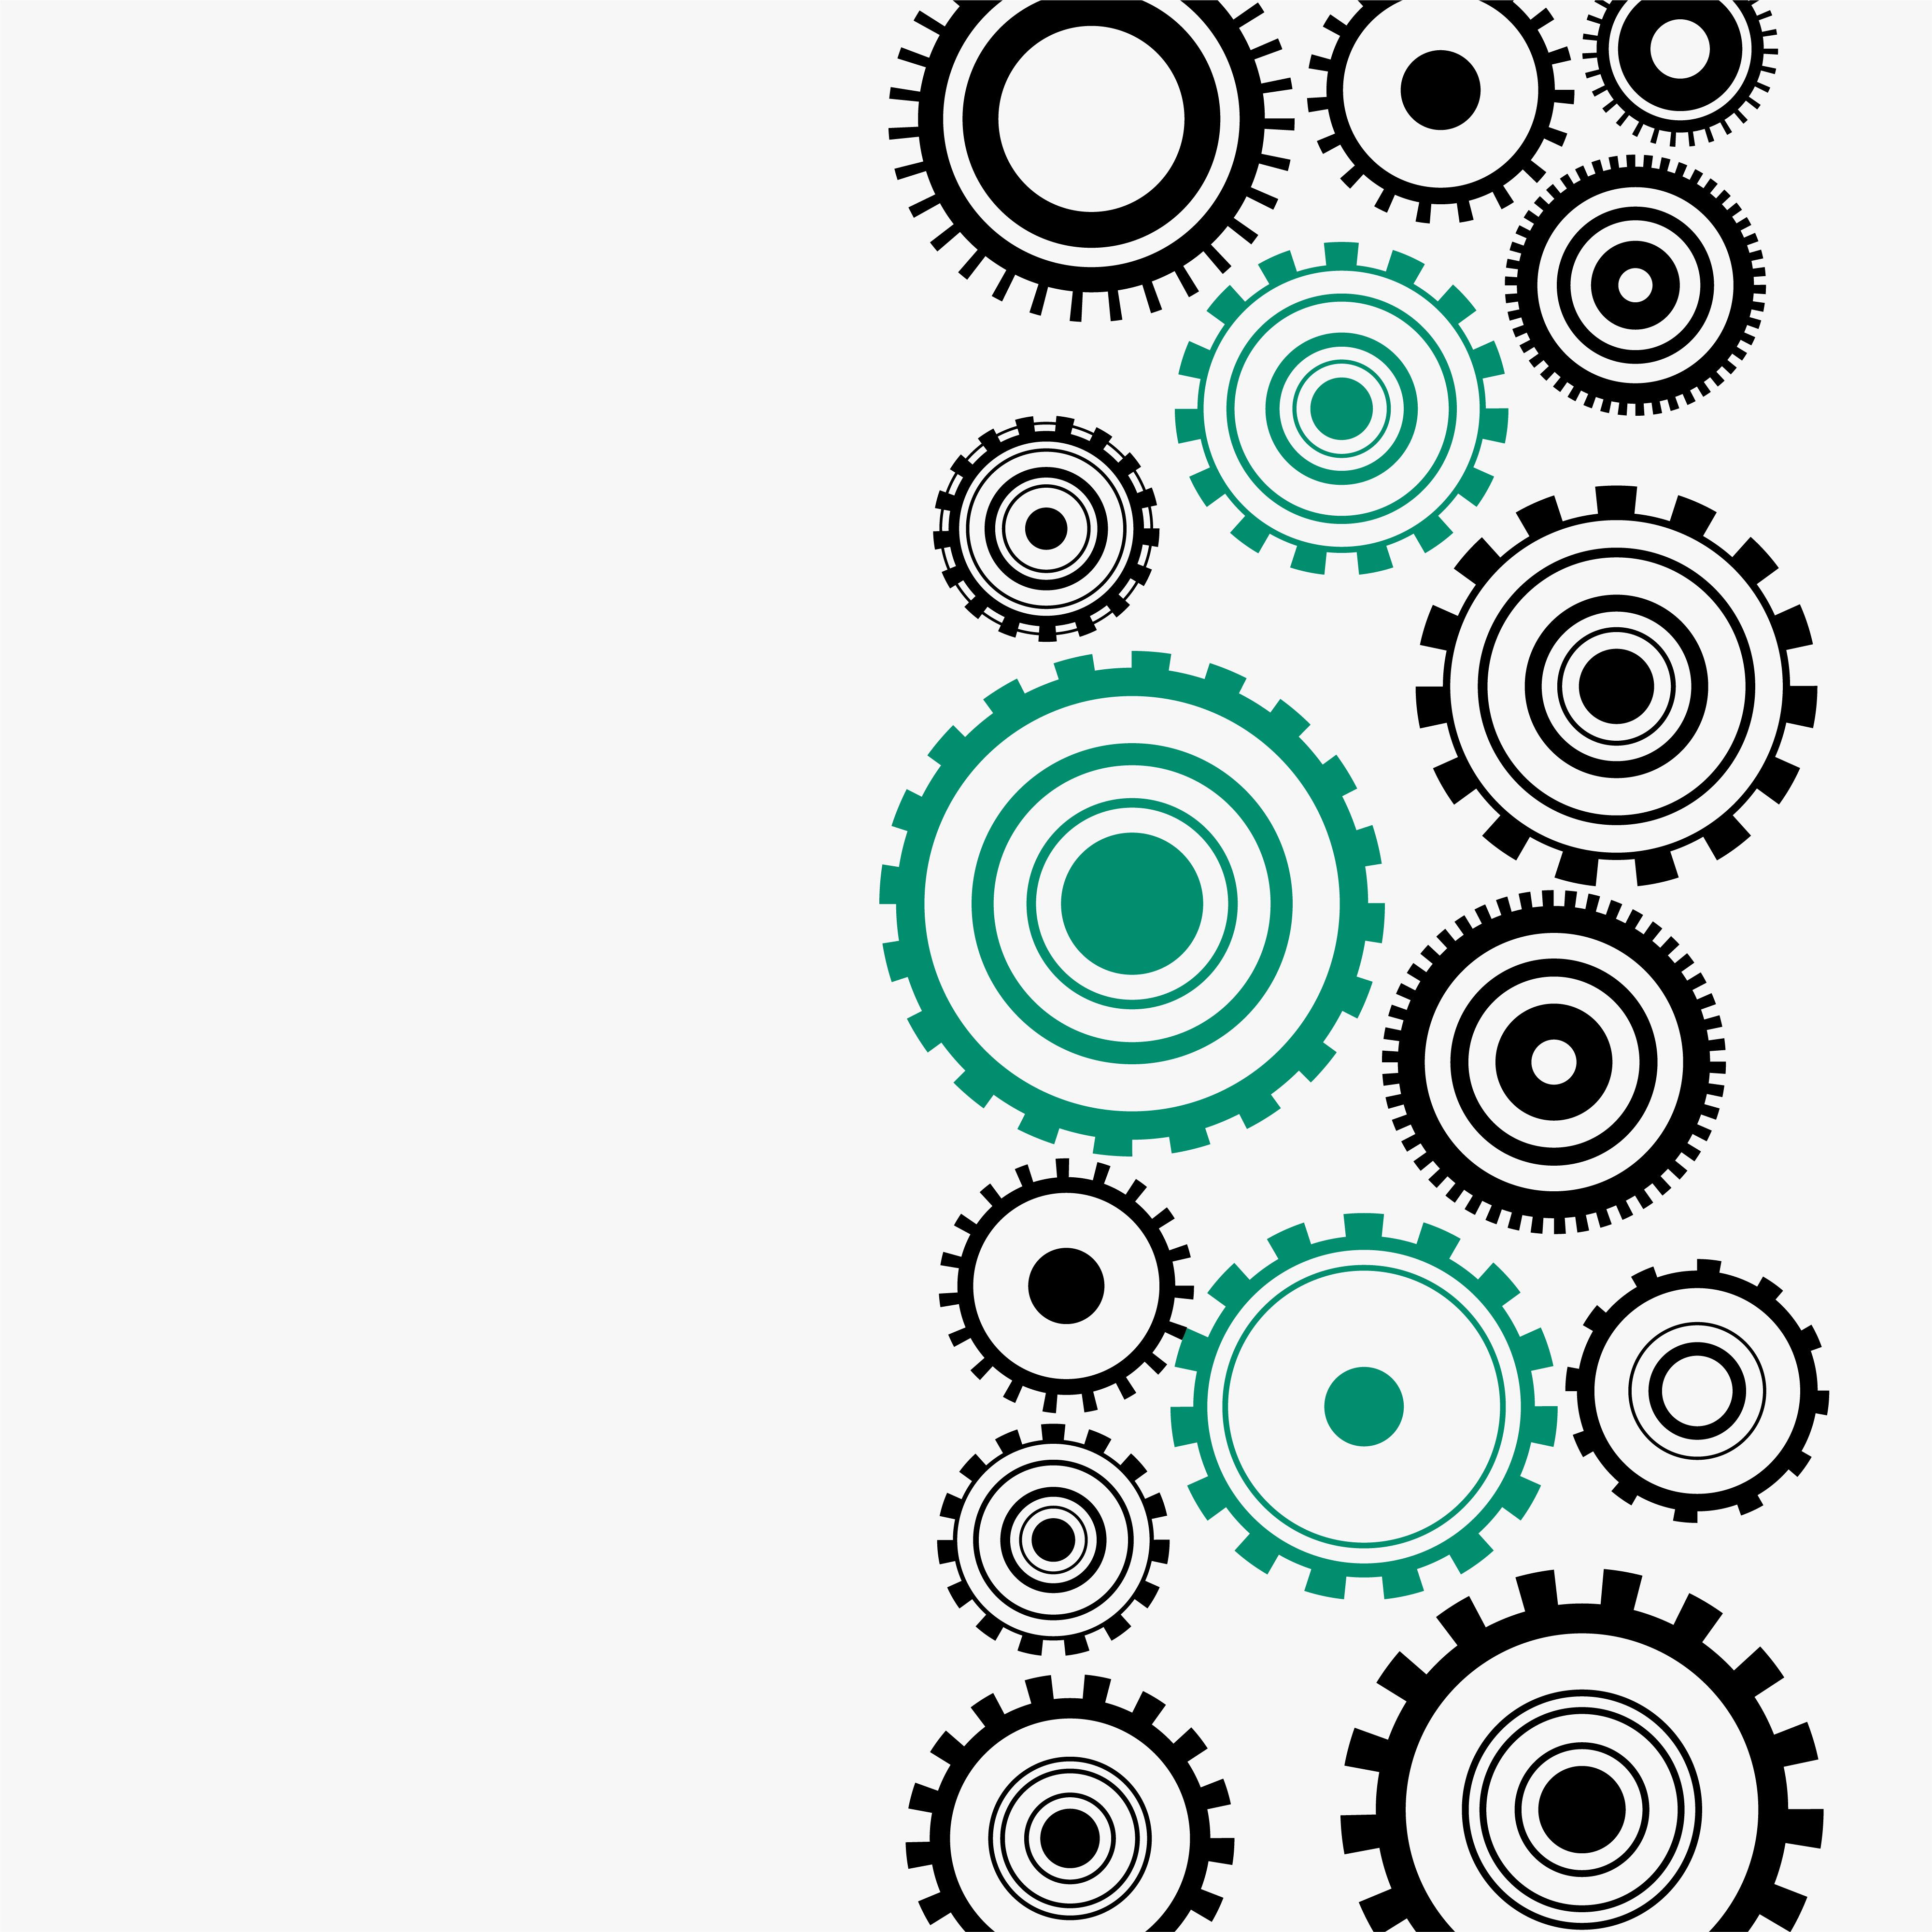 Gear Wheels Diagram On White Background